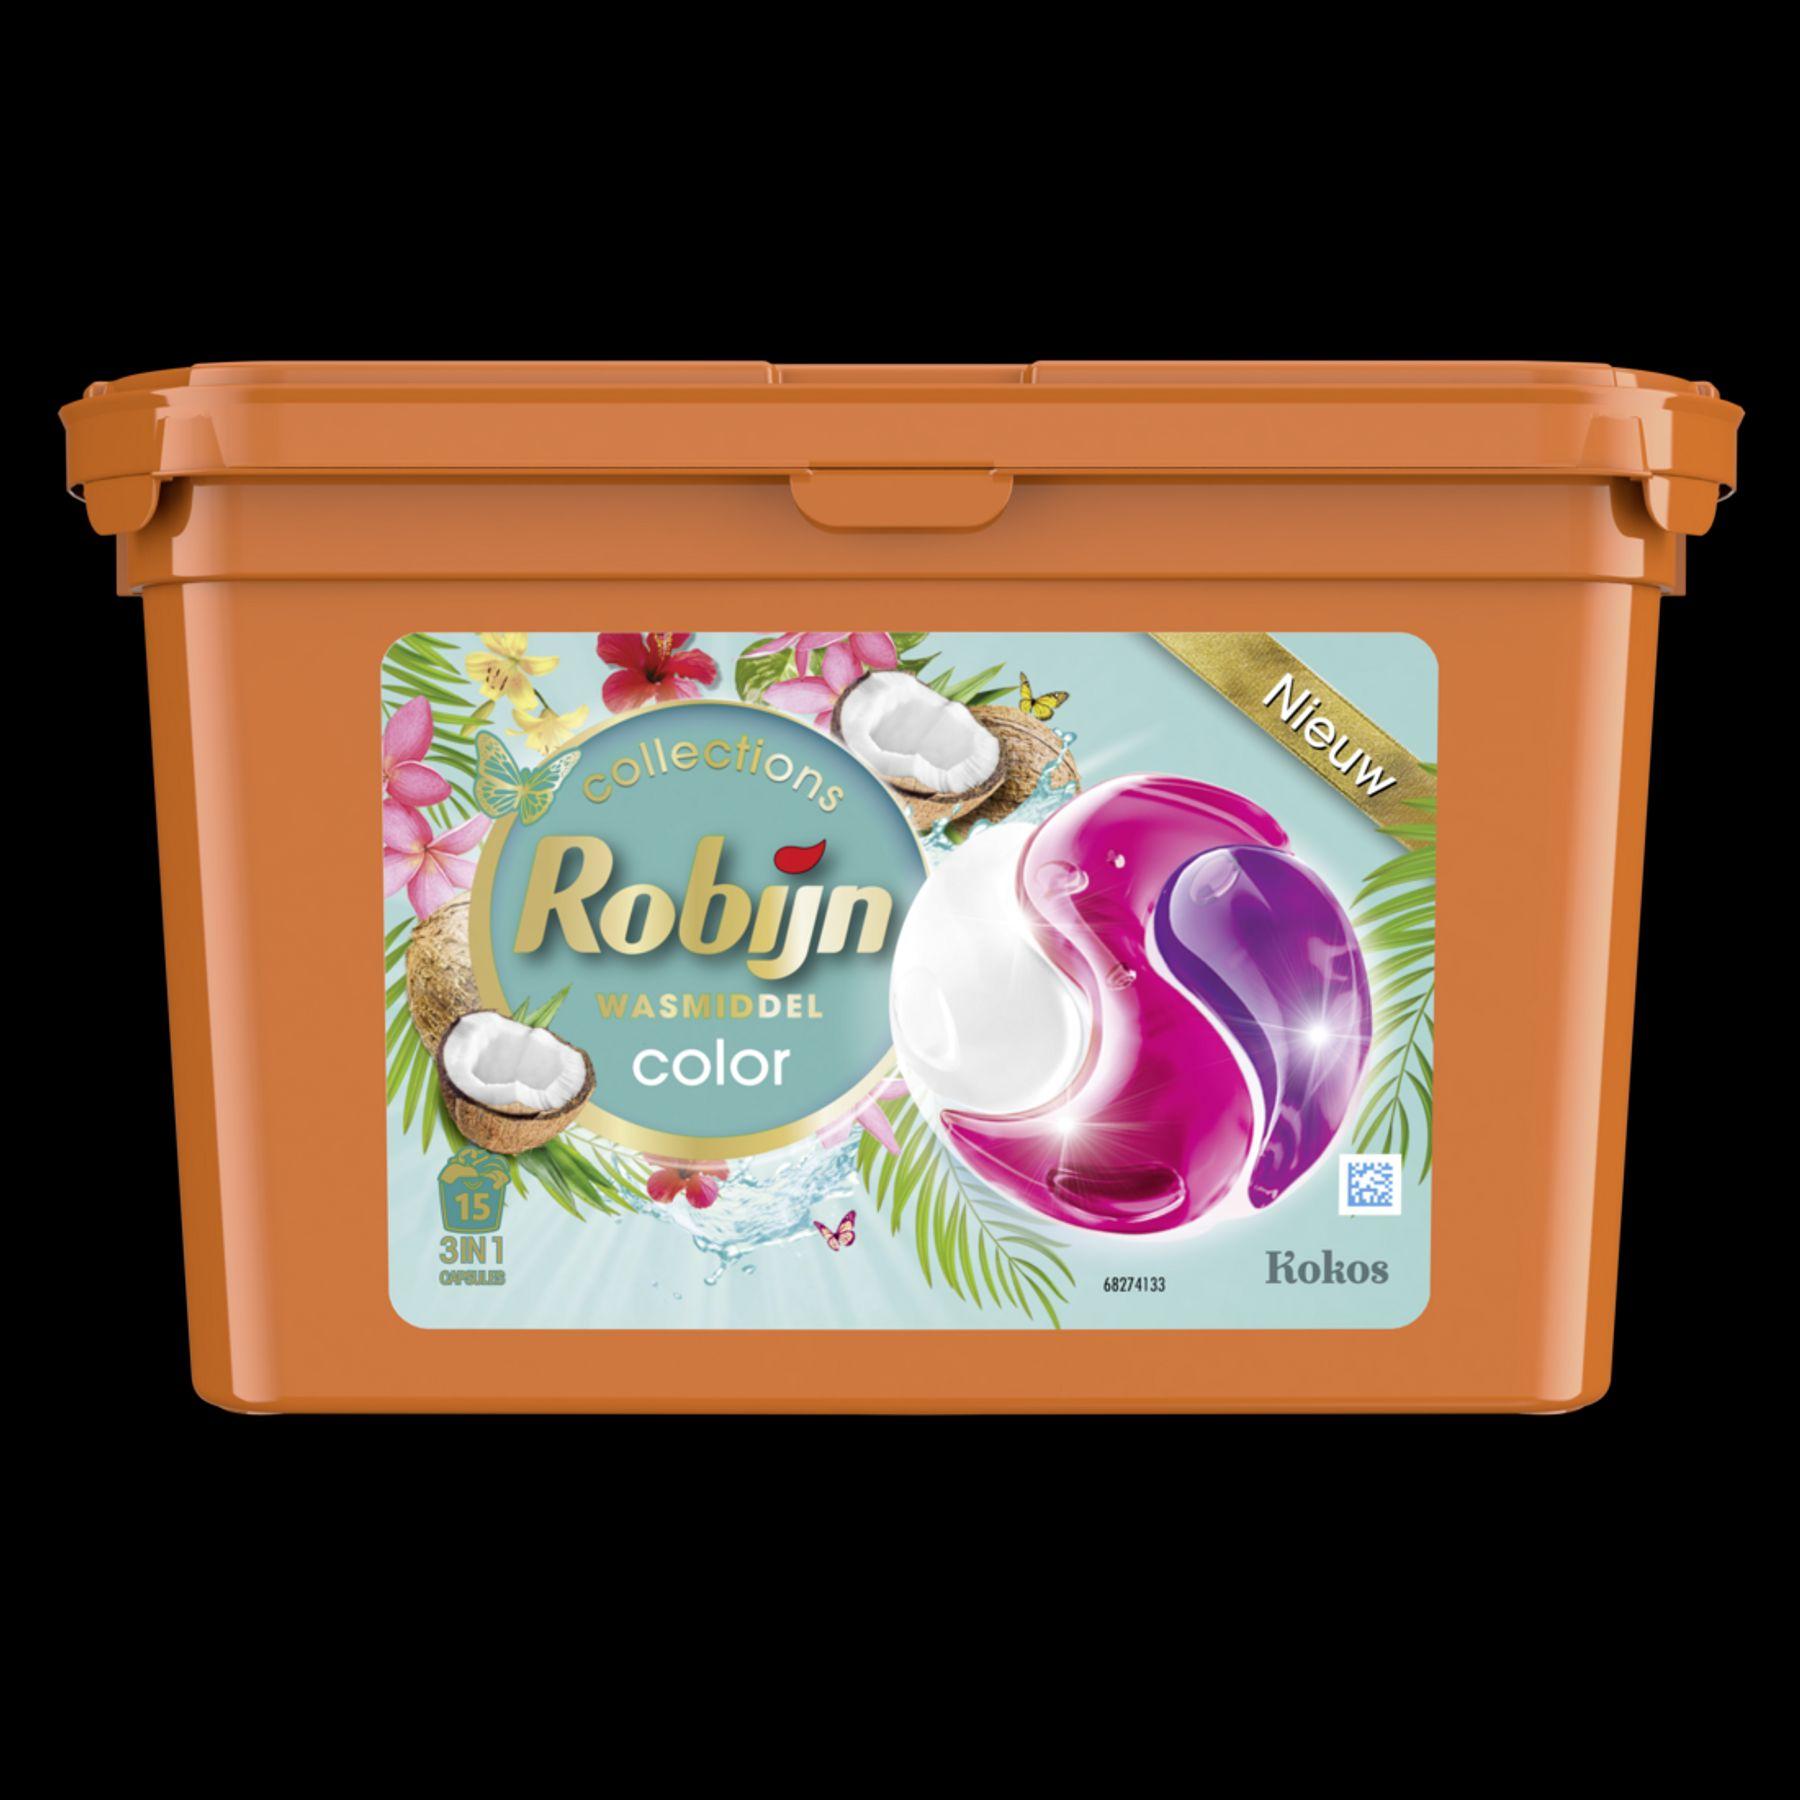 Robijn Collections Capsules Kokos